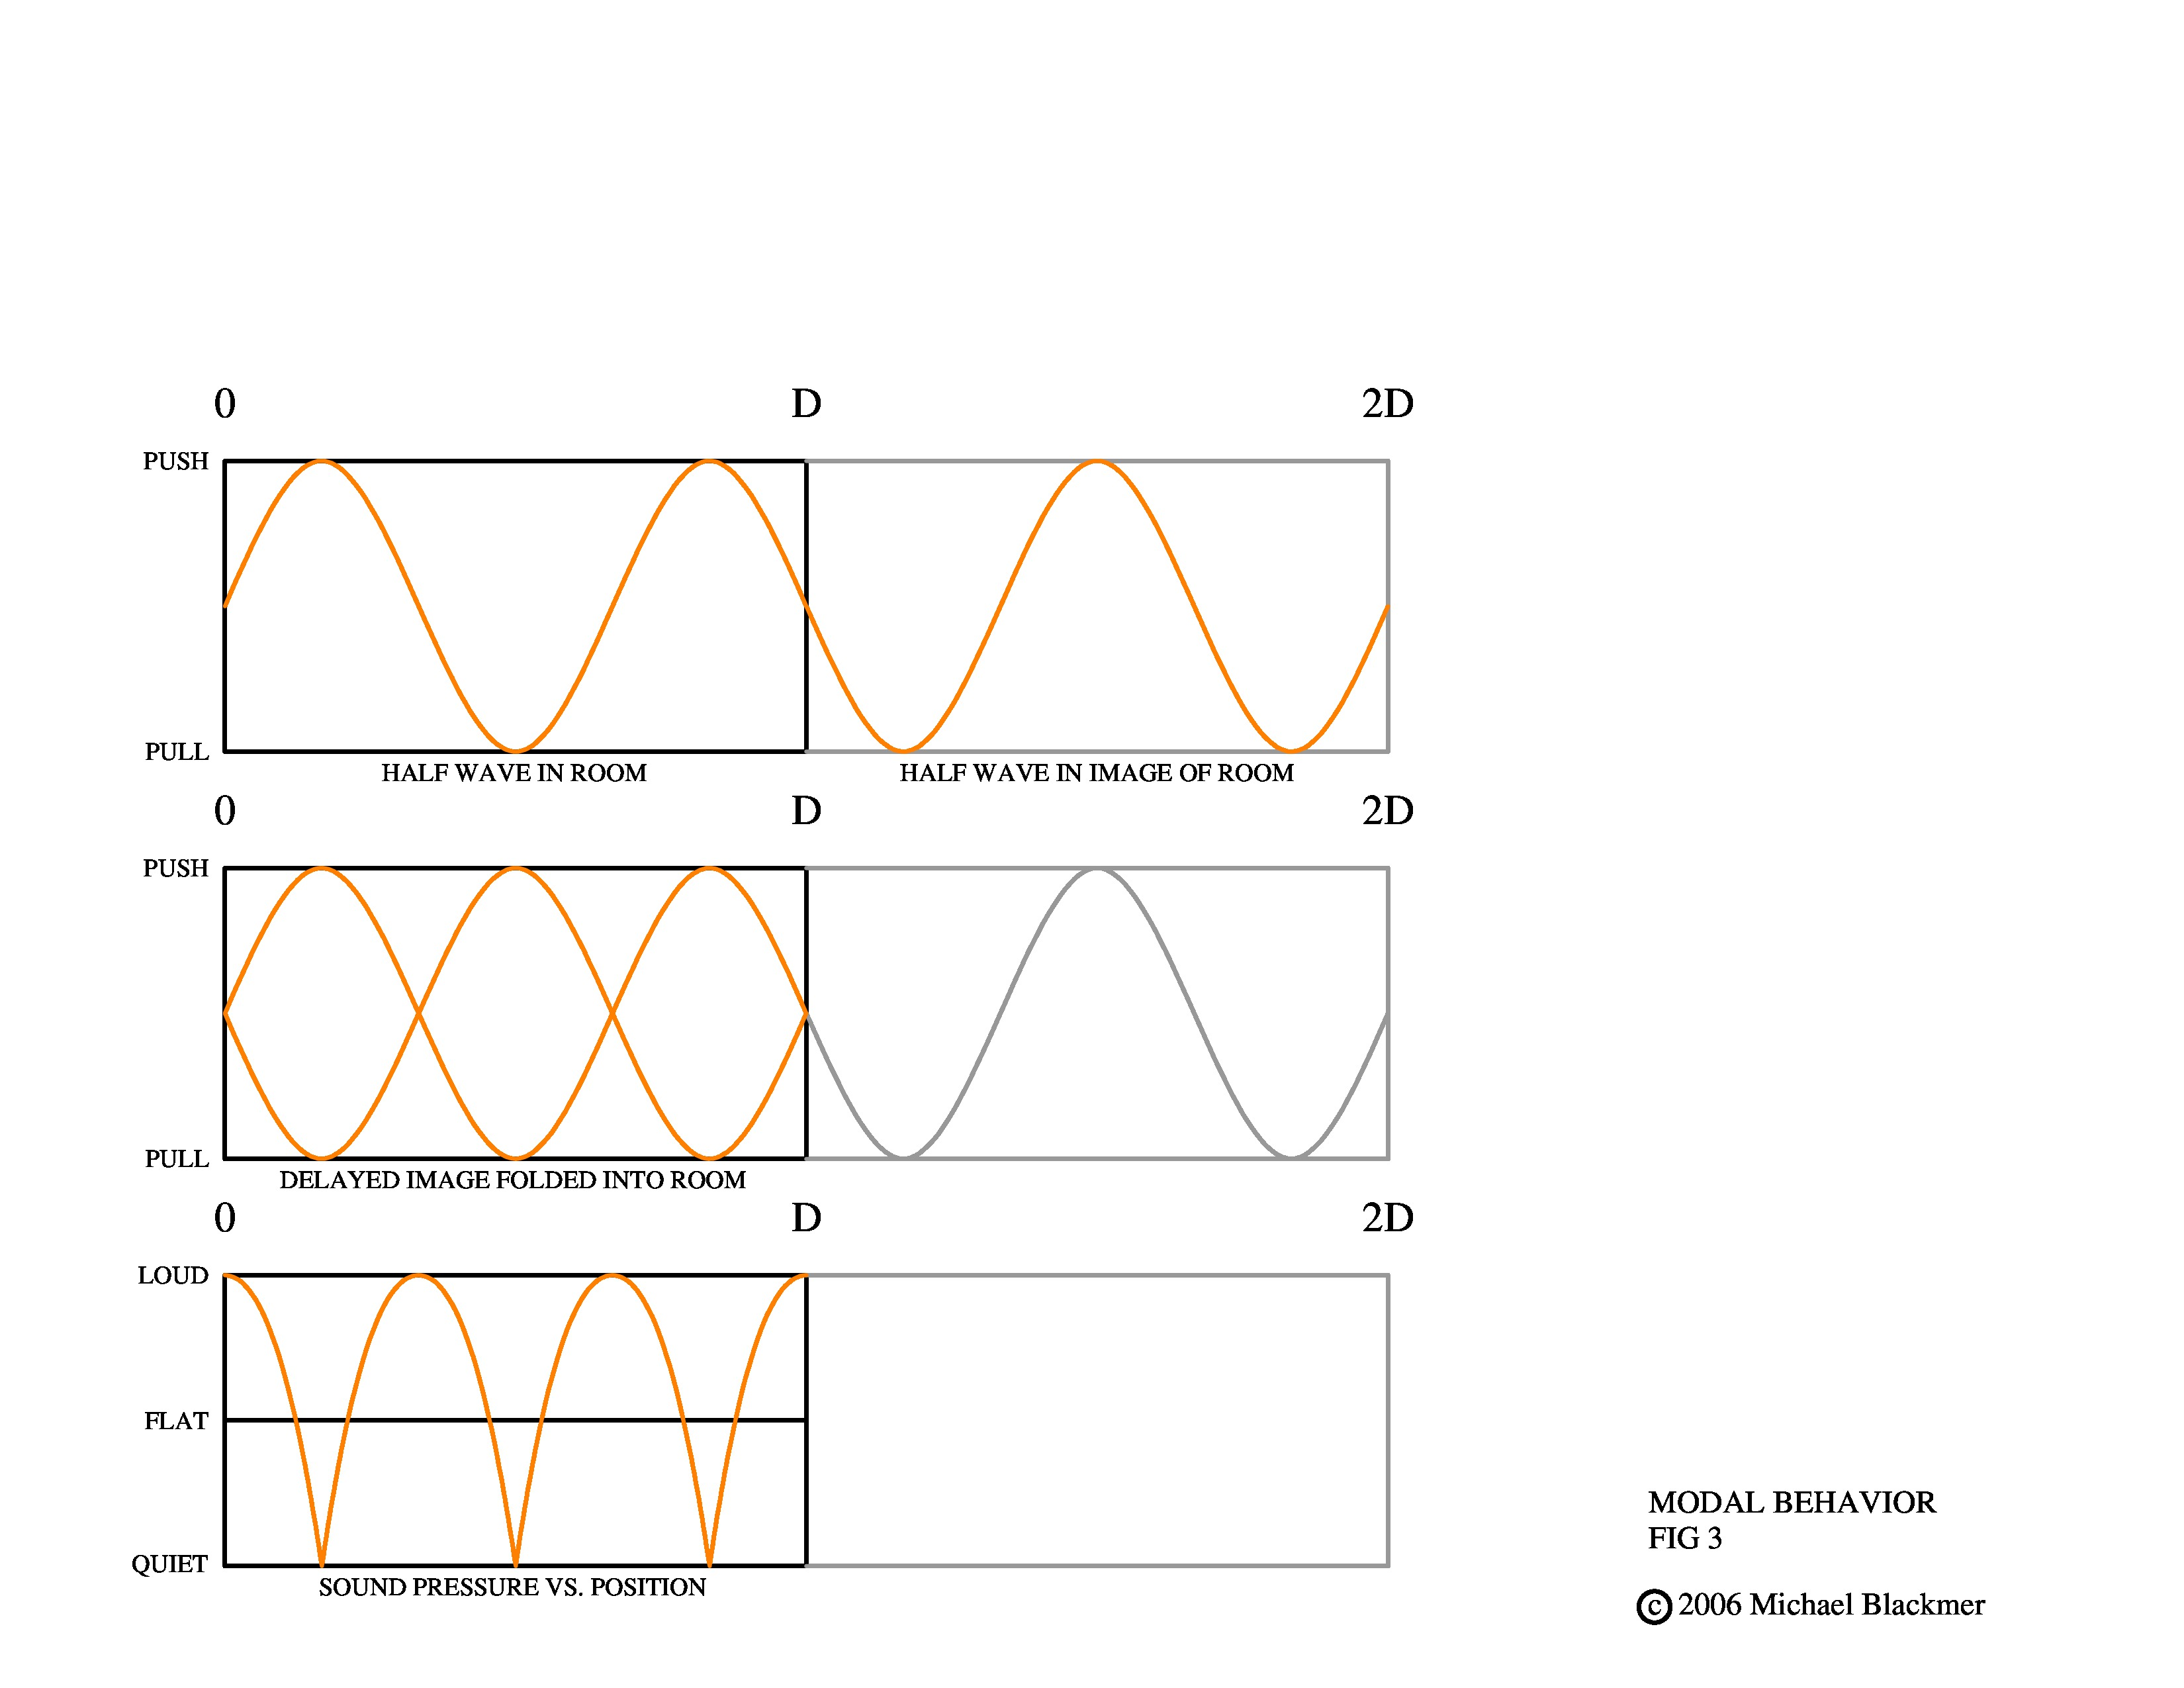 master-modal-behavior-demo-3-for-pad-fig-3-2-page-0